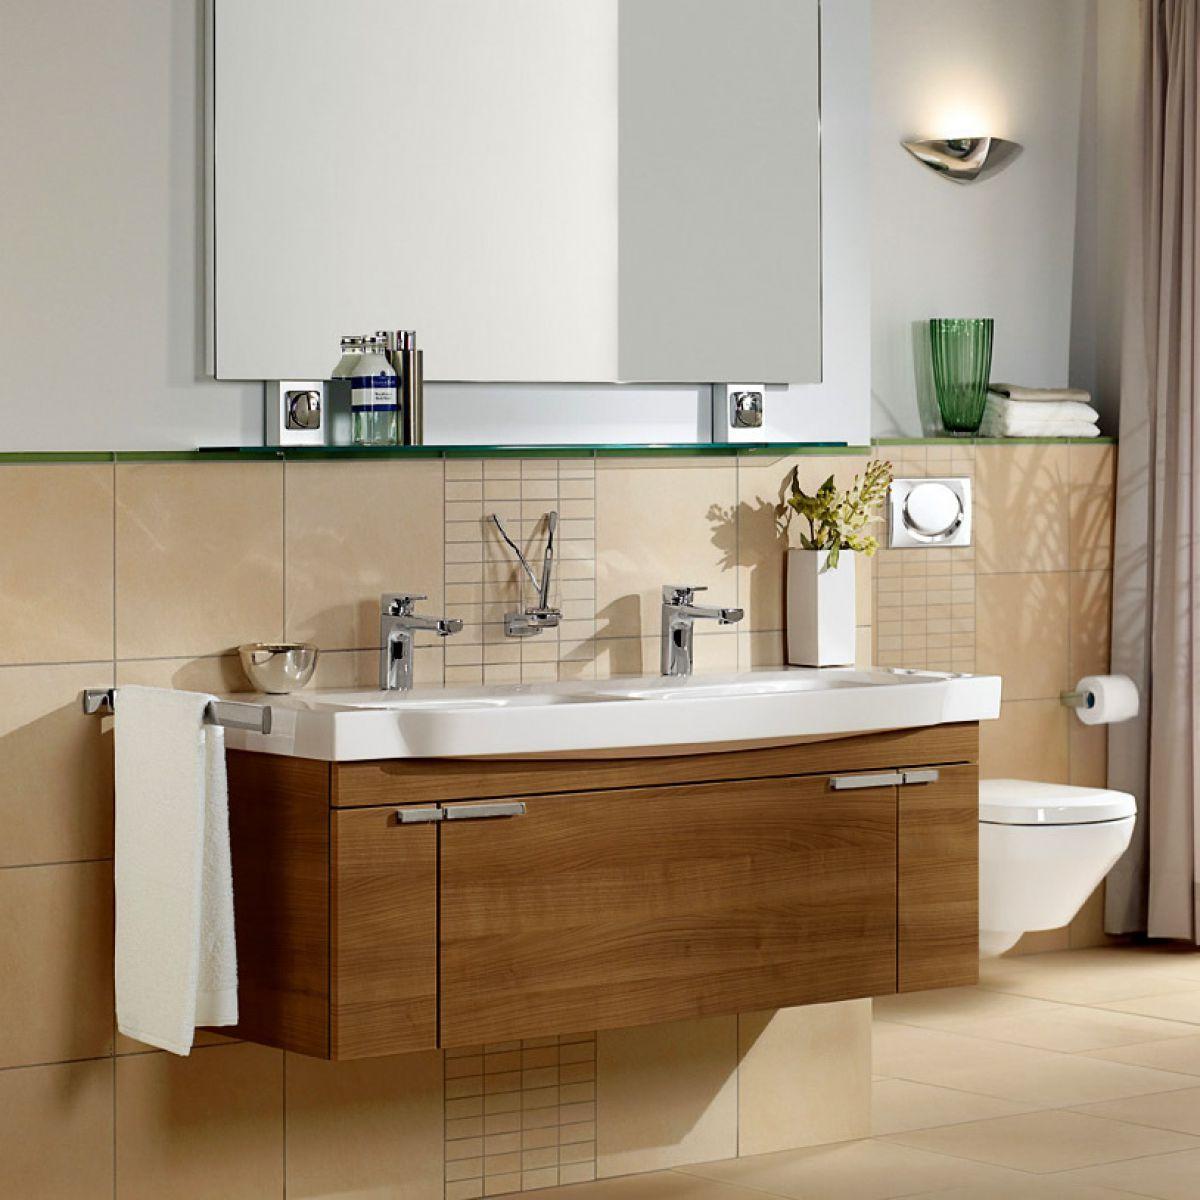 Villeroy and boch bathroom cabinets - Villeroy Boch Bernina Tiles 2393 30 X 30cm